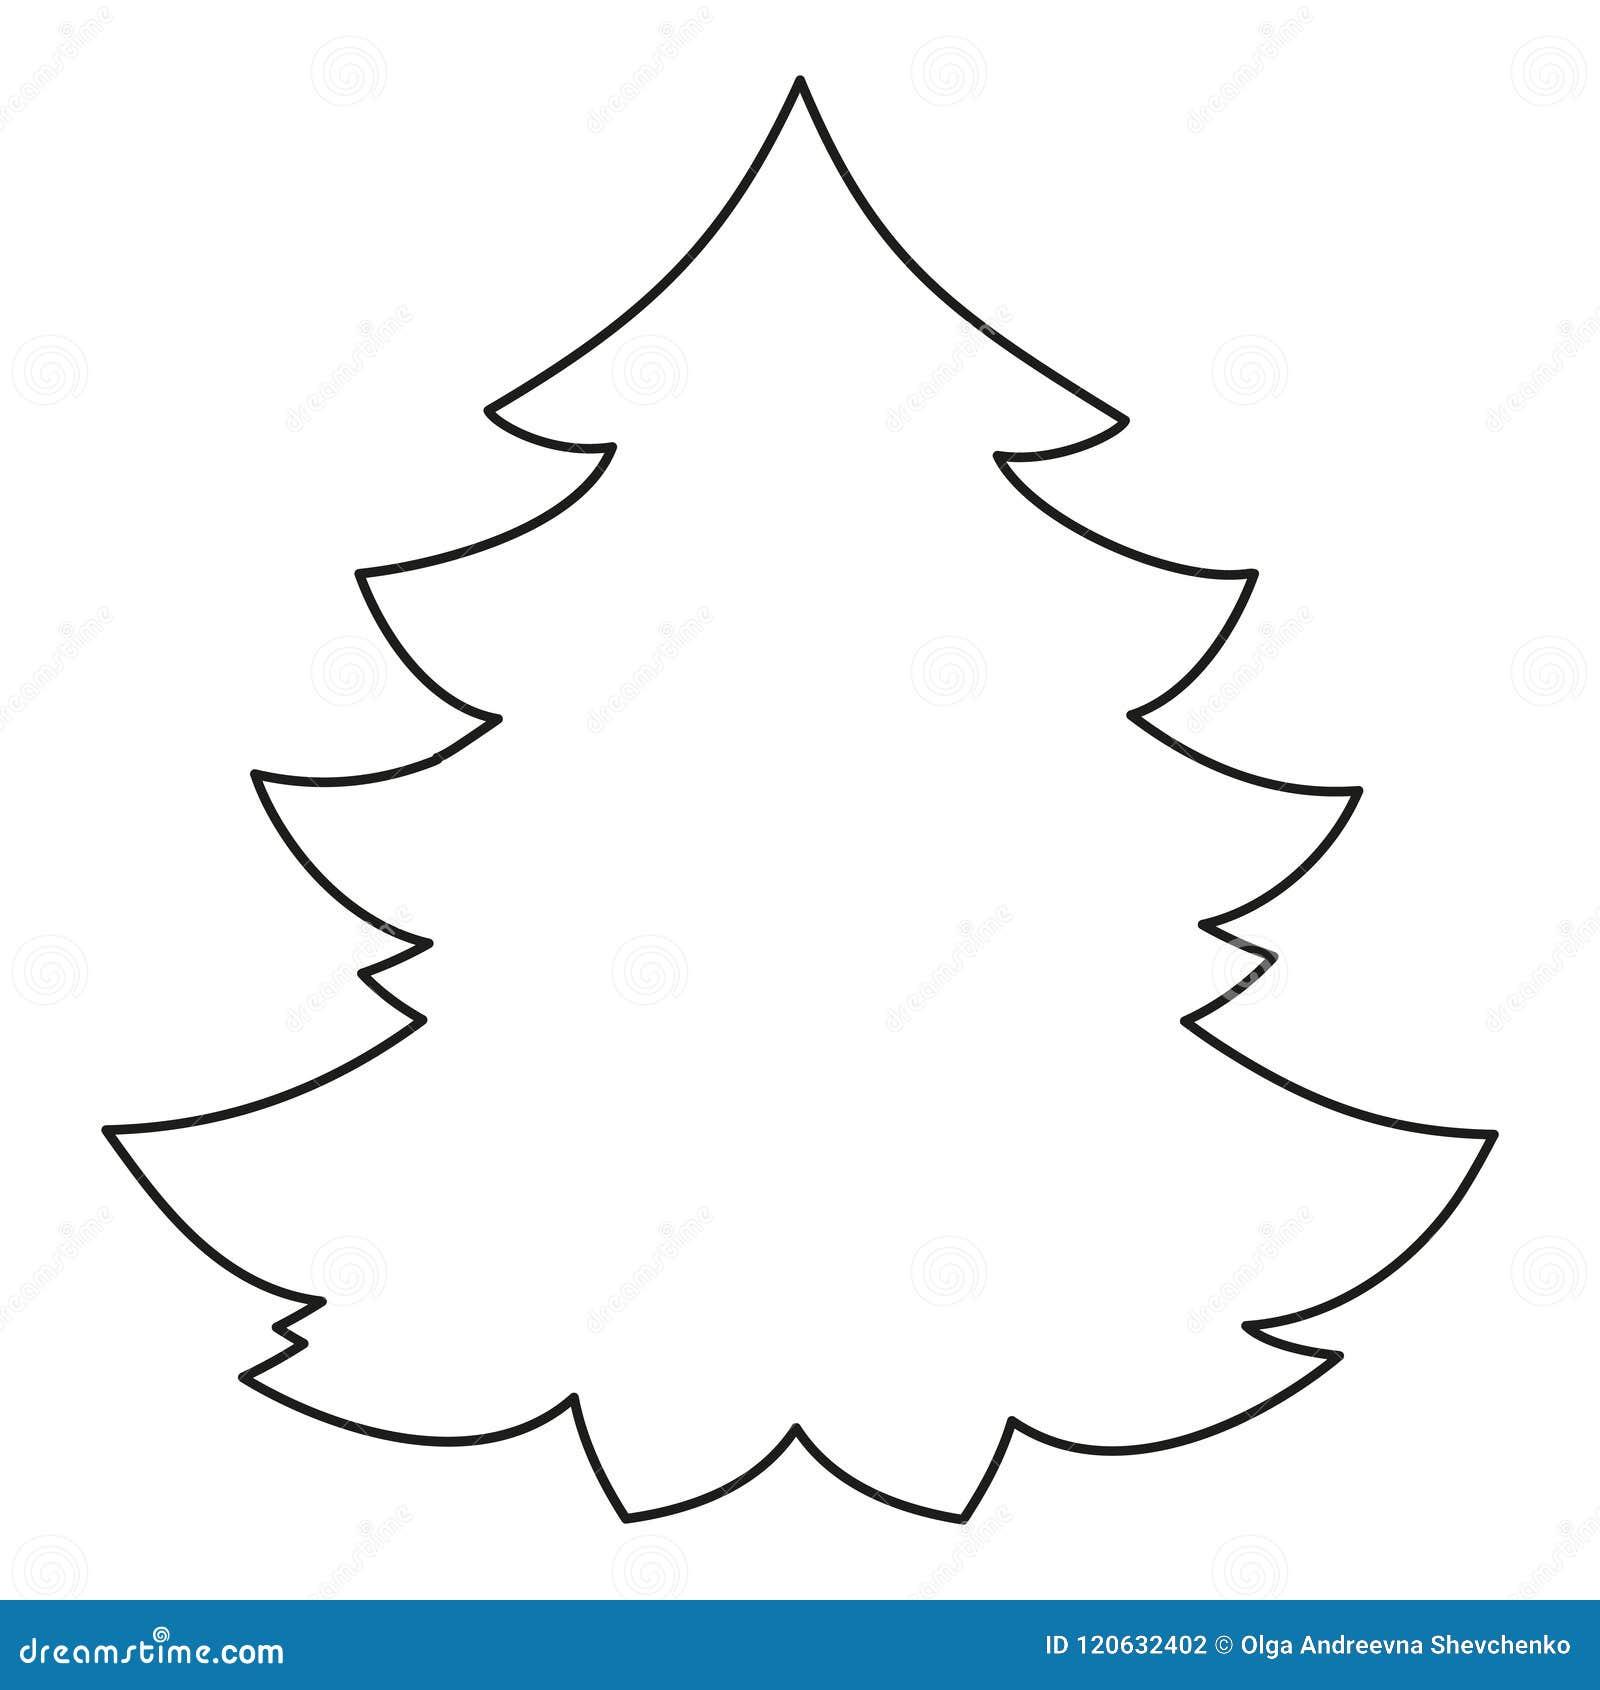 Line Art Black And White Christmas Tree Stock Vector